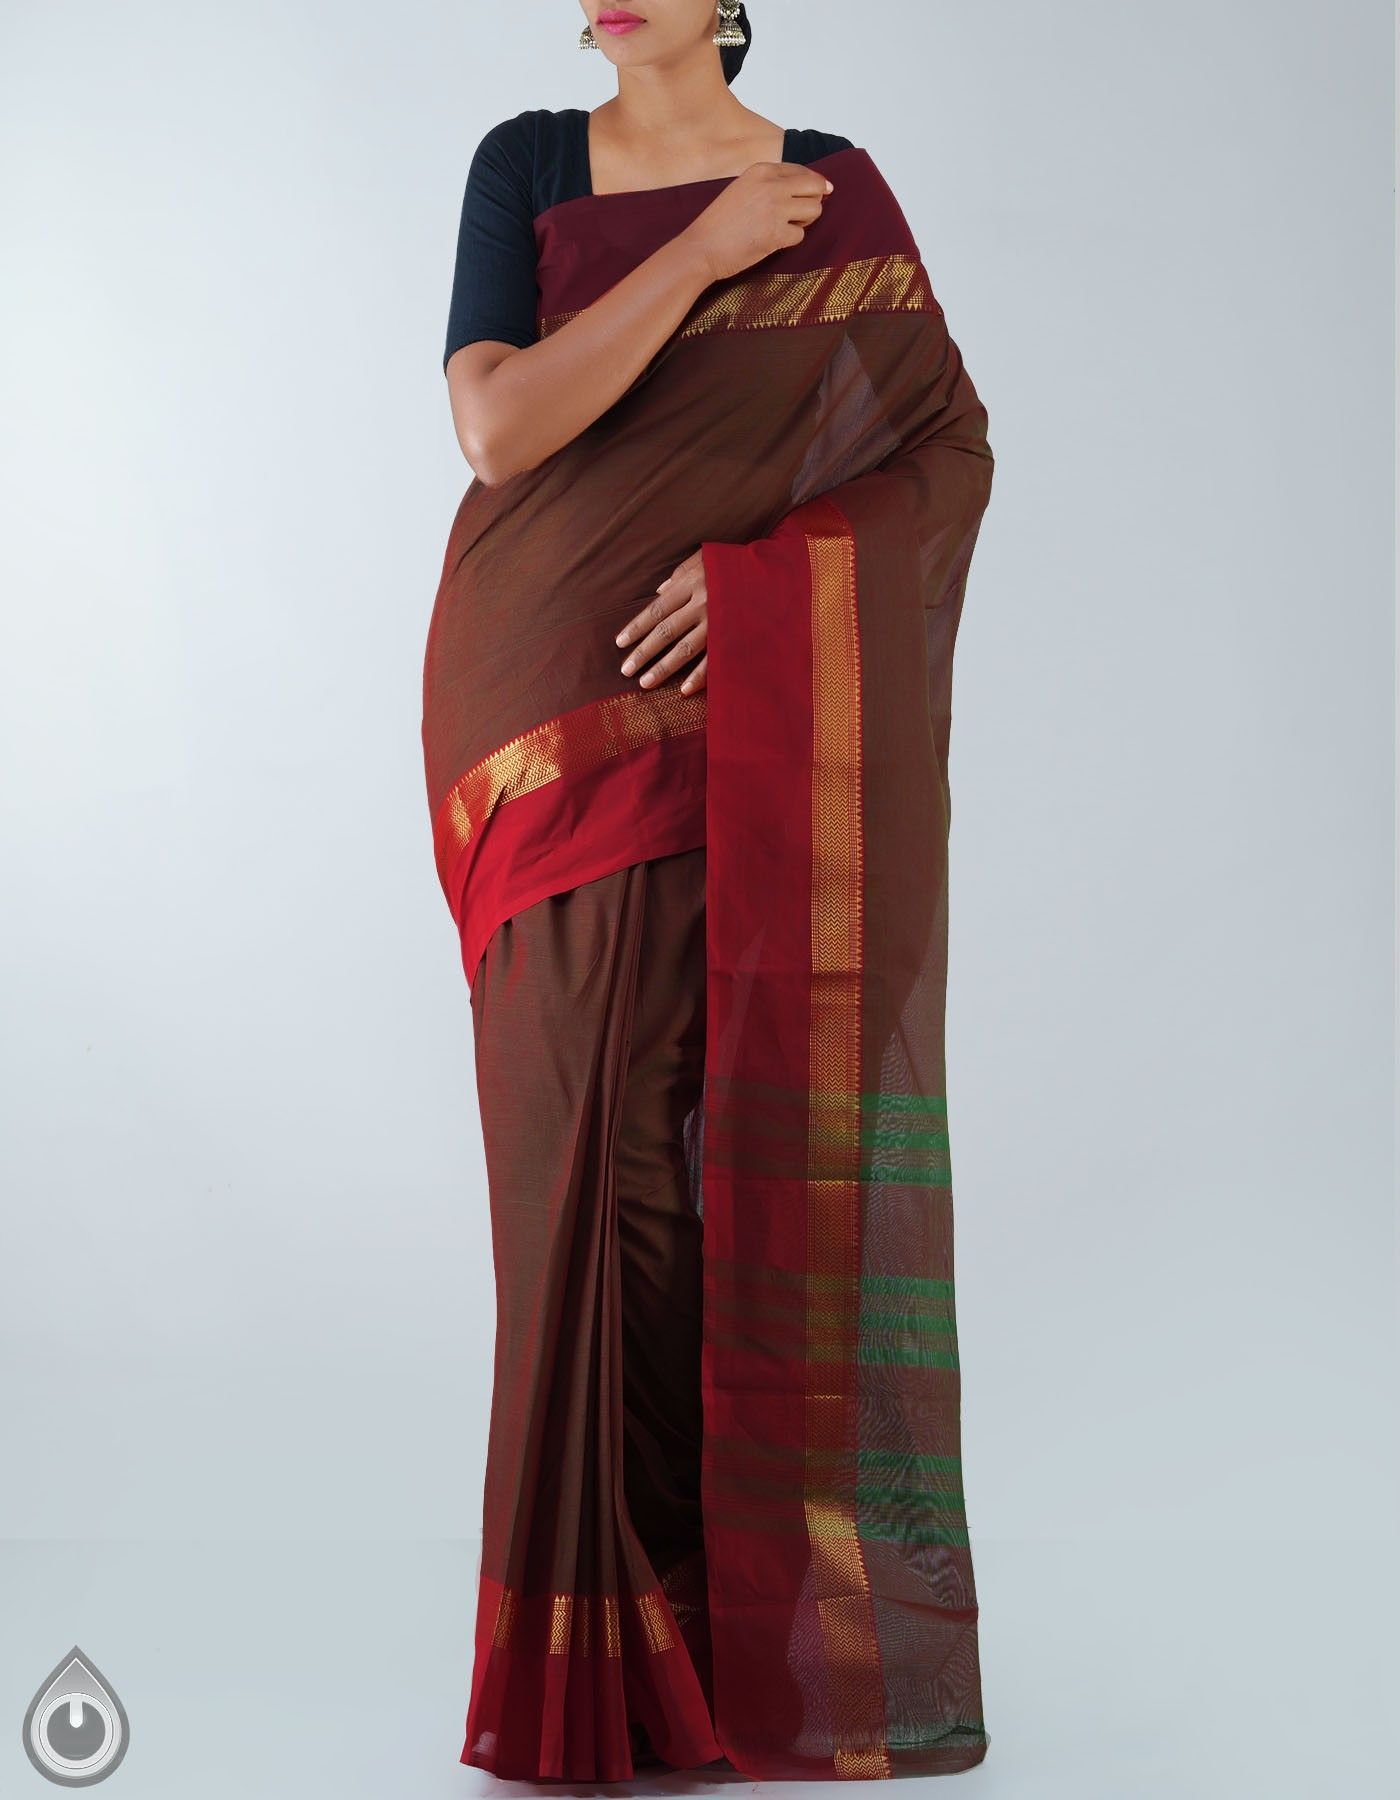 09de02f717 Green and Orange Pure Handloom Chettinad Cotton Saree,It has green thread  woven stripes elegant pallu ,This beautiful saree comes with Handloom  Mark,This ...